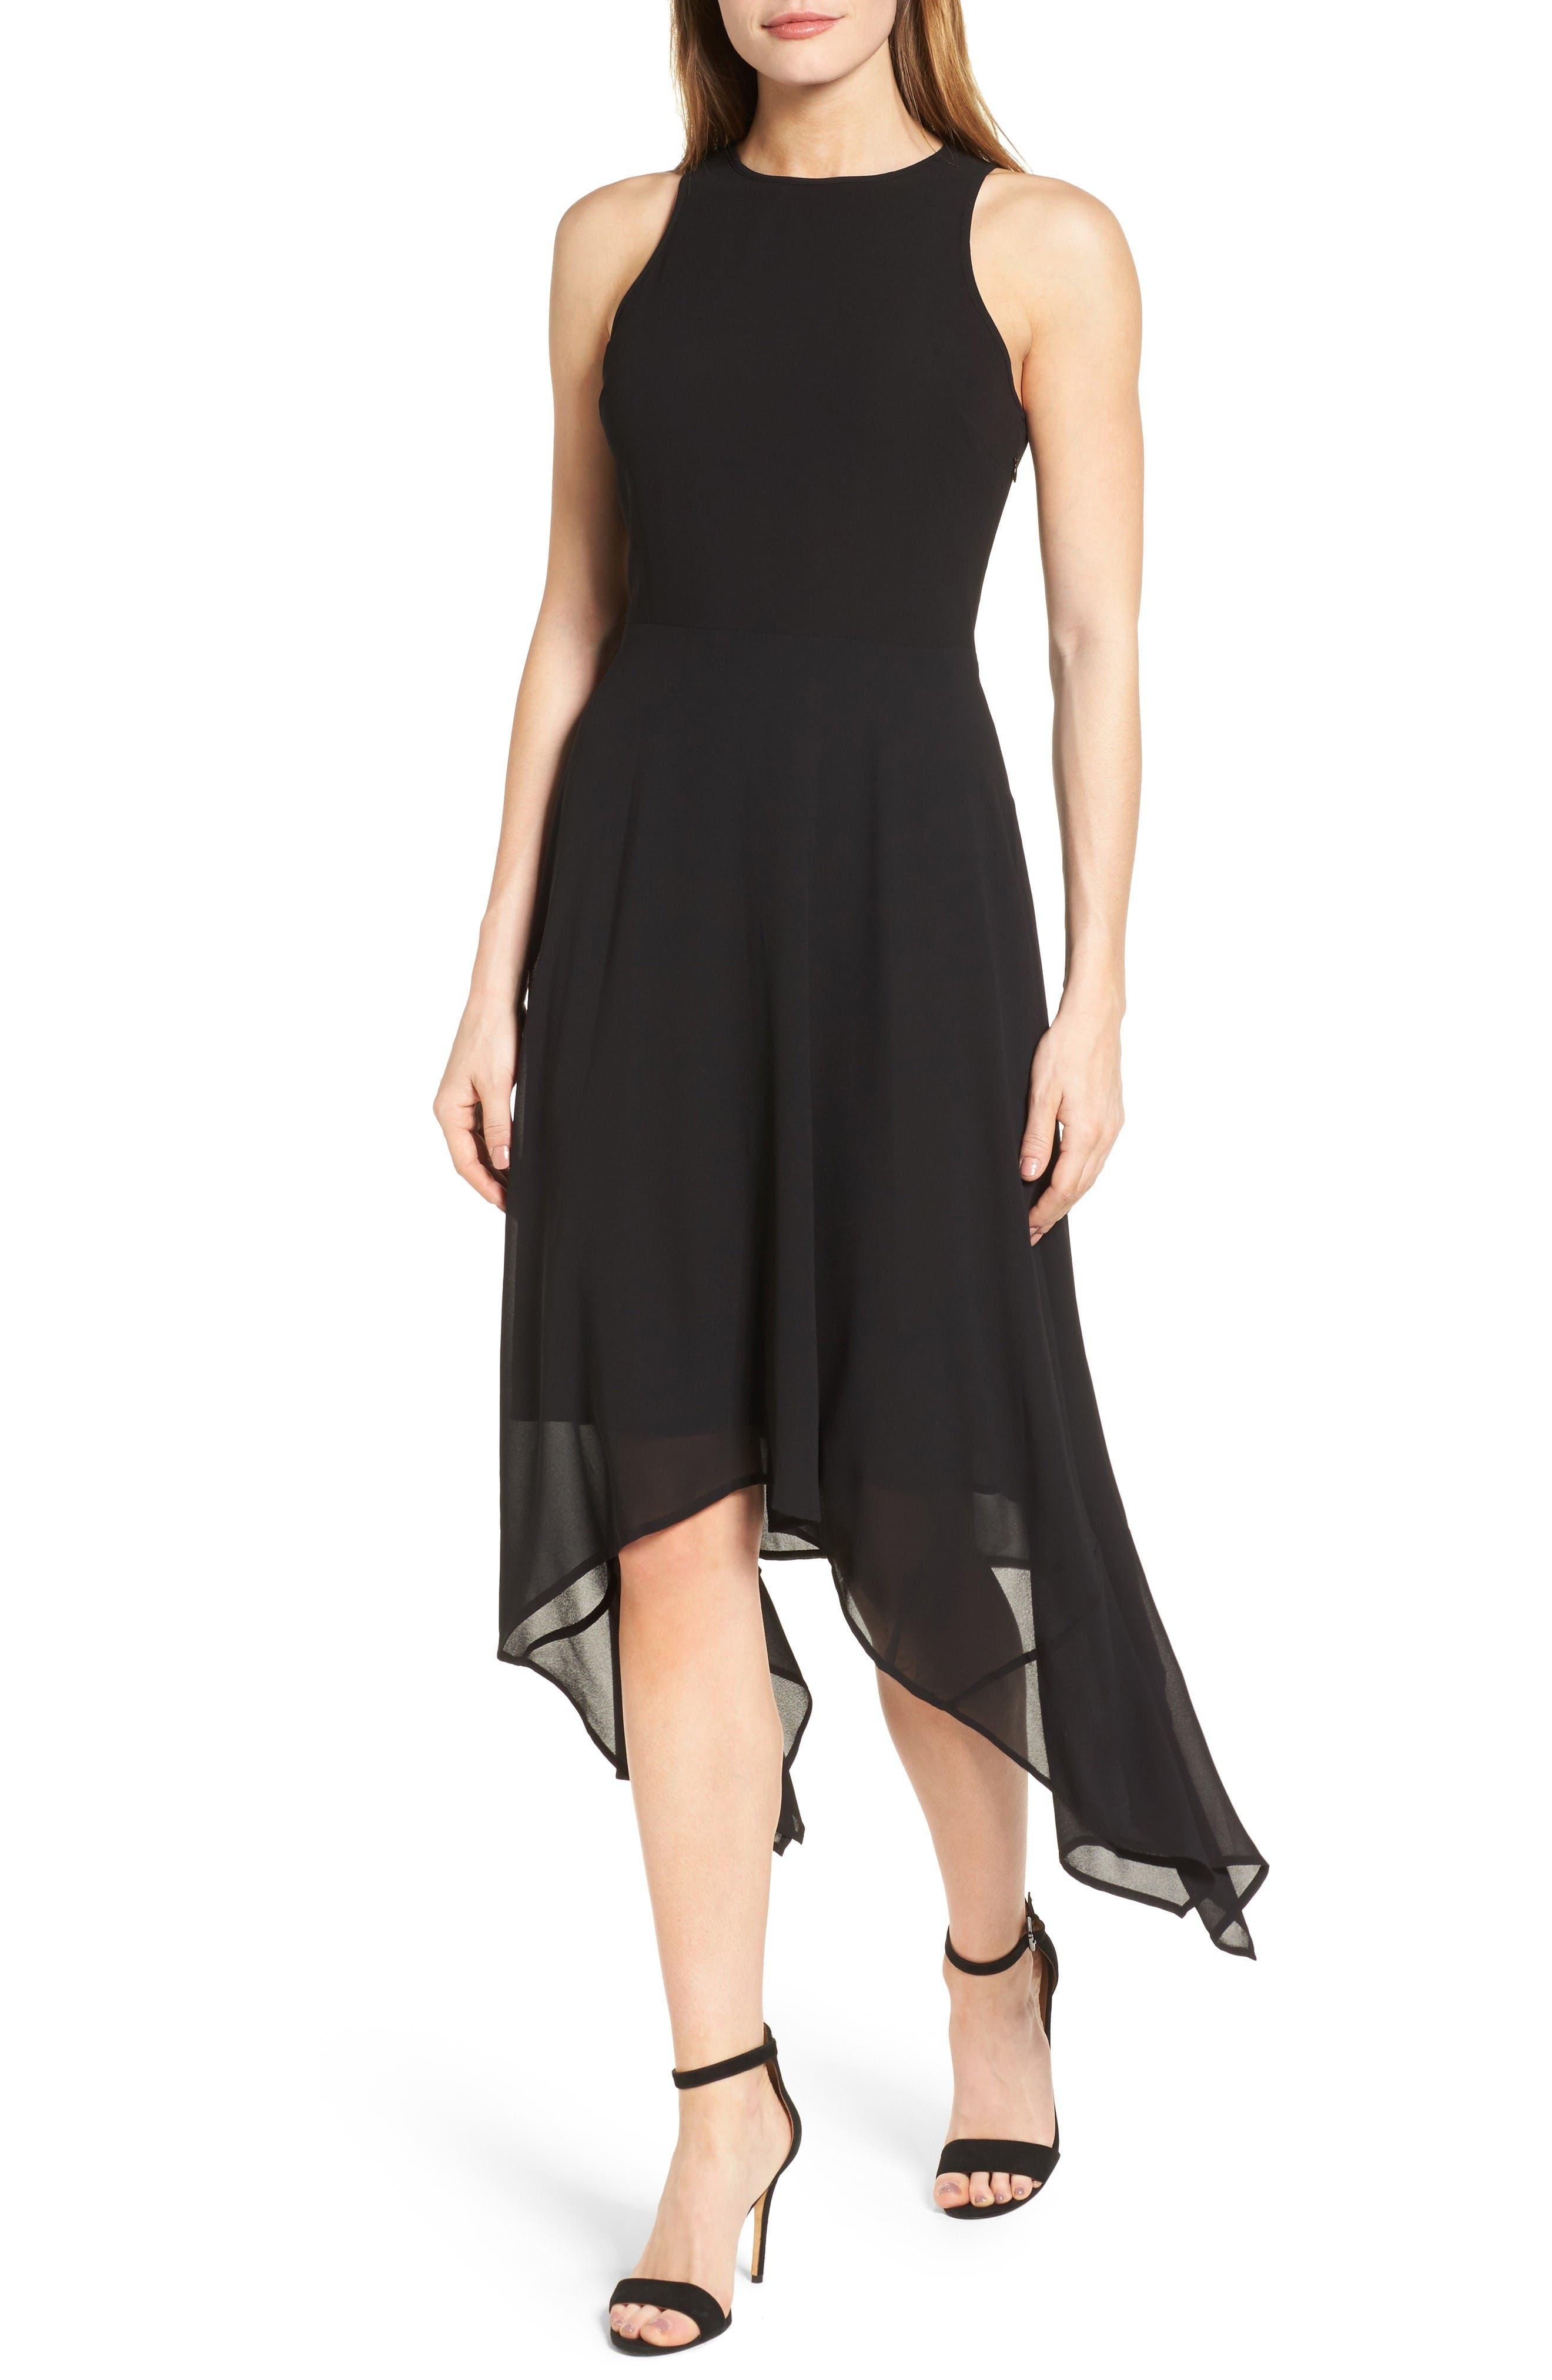 Alternate Image 1 Selected - MICHAEL Michael Kors High/Low Georgette Dress